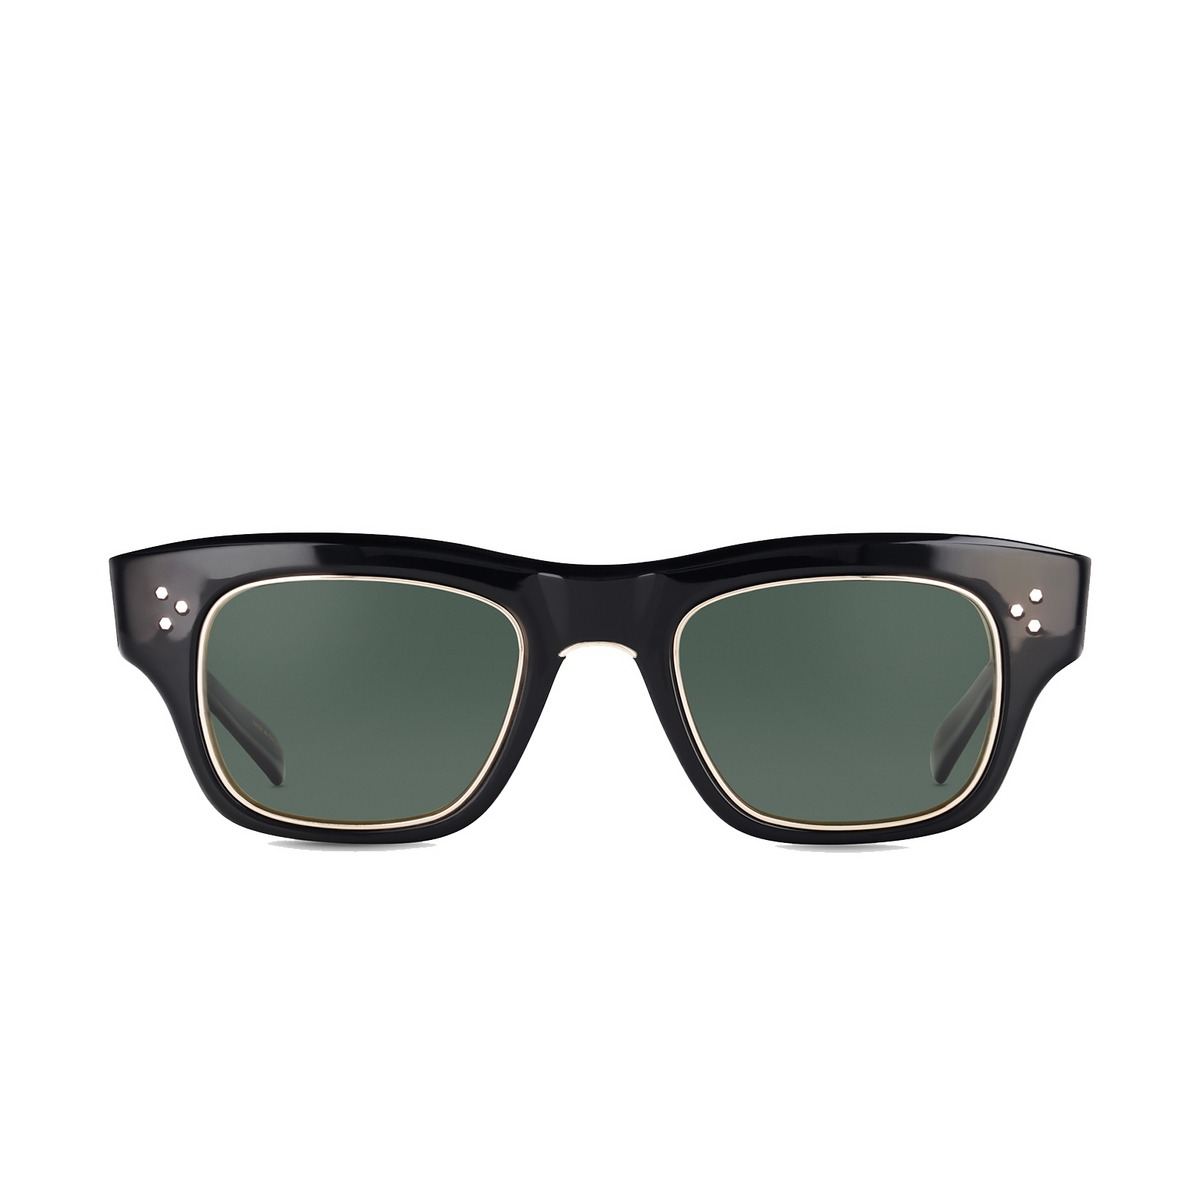 Mr. Leight® Square Sunglasses: Go S color BK-12KWG/G15GLSSPLR.